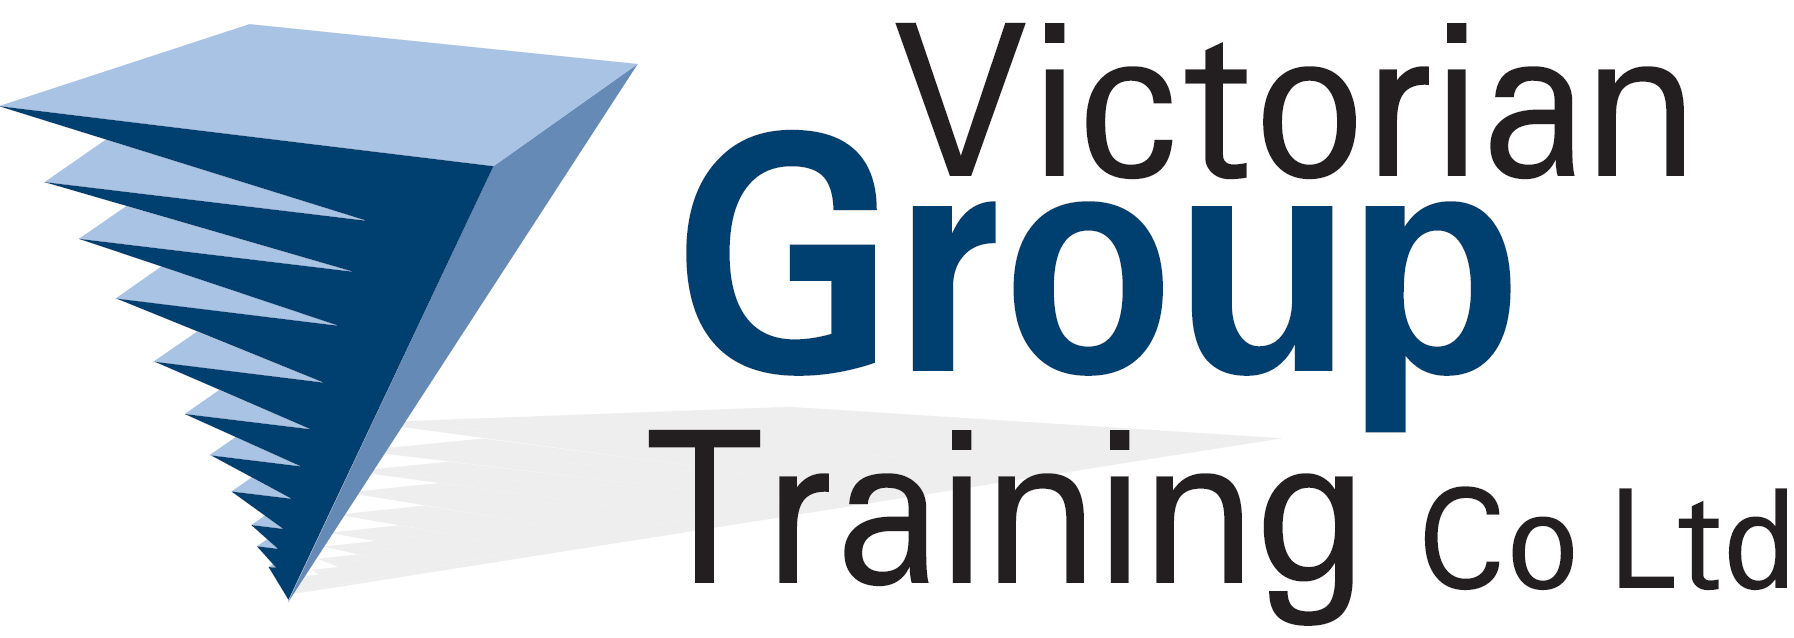 Victorian Group Training